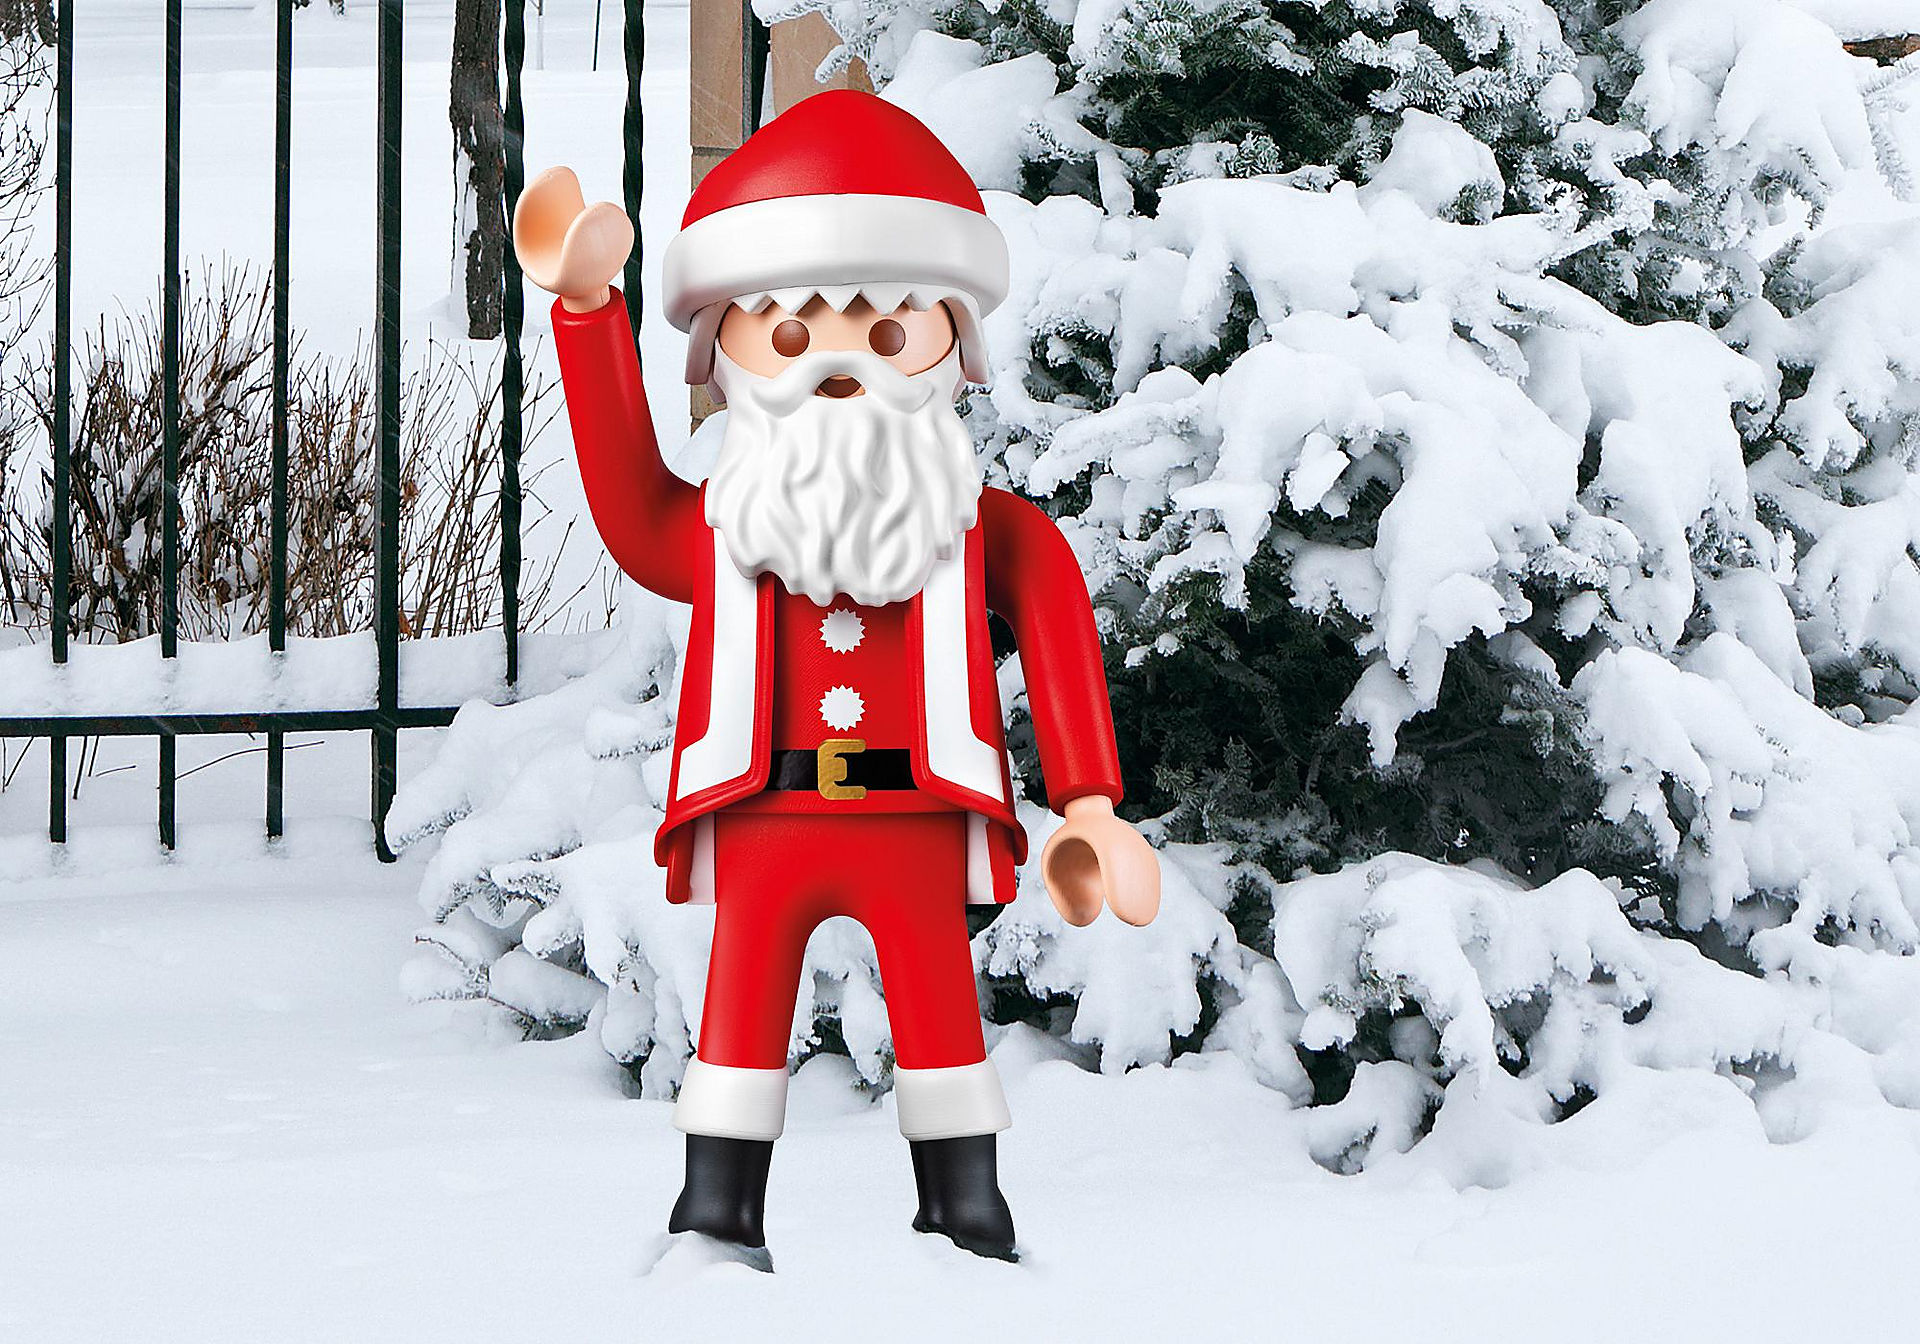 6629 PLAYMOBIL XXL-Weihnachtsmann zoom image5